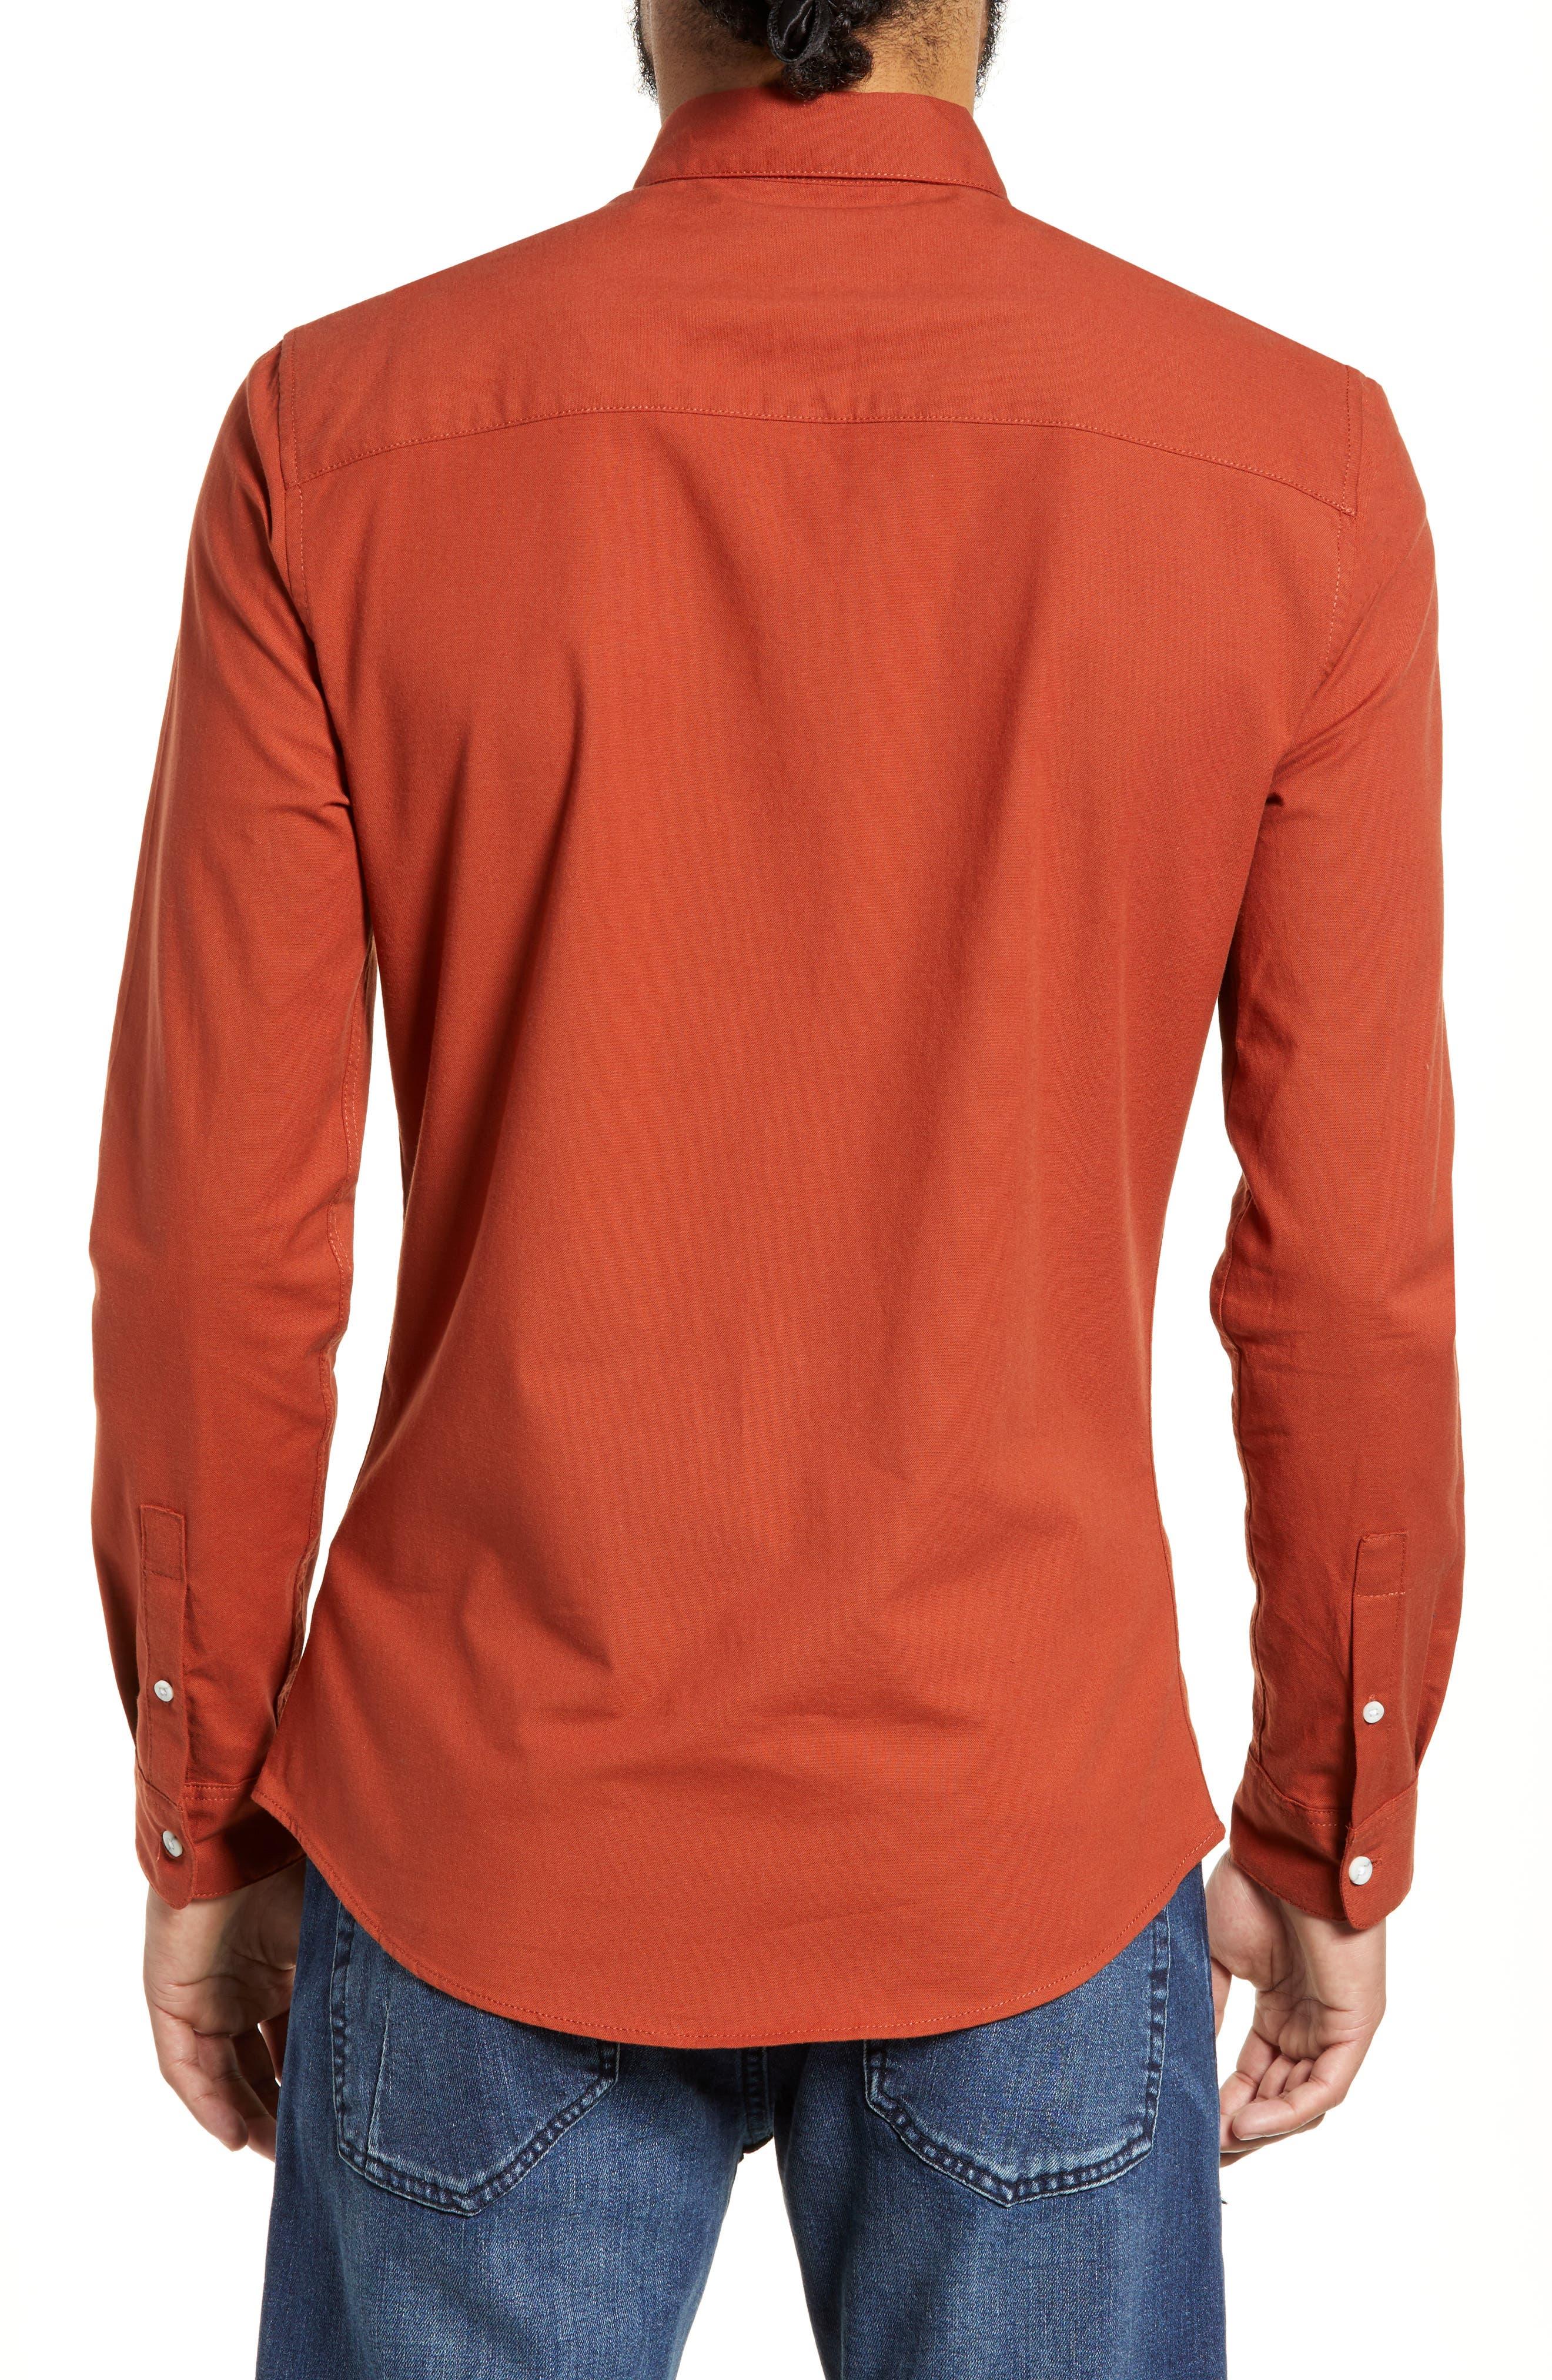 TOPMAN,                             Classic Fit Oxford Shirt,                             Alternate thumbnail 3, color,                             BROWN